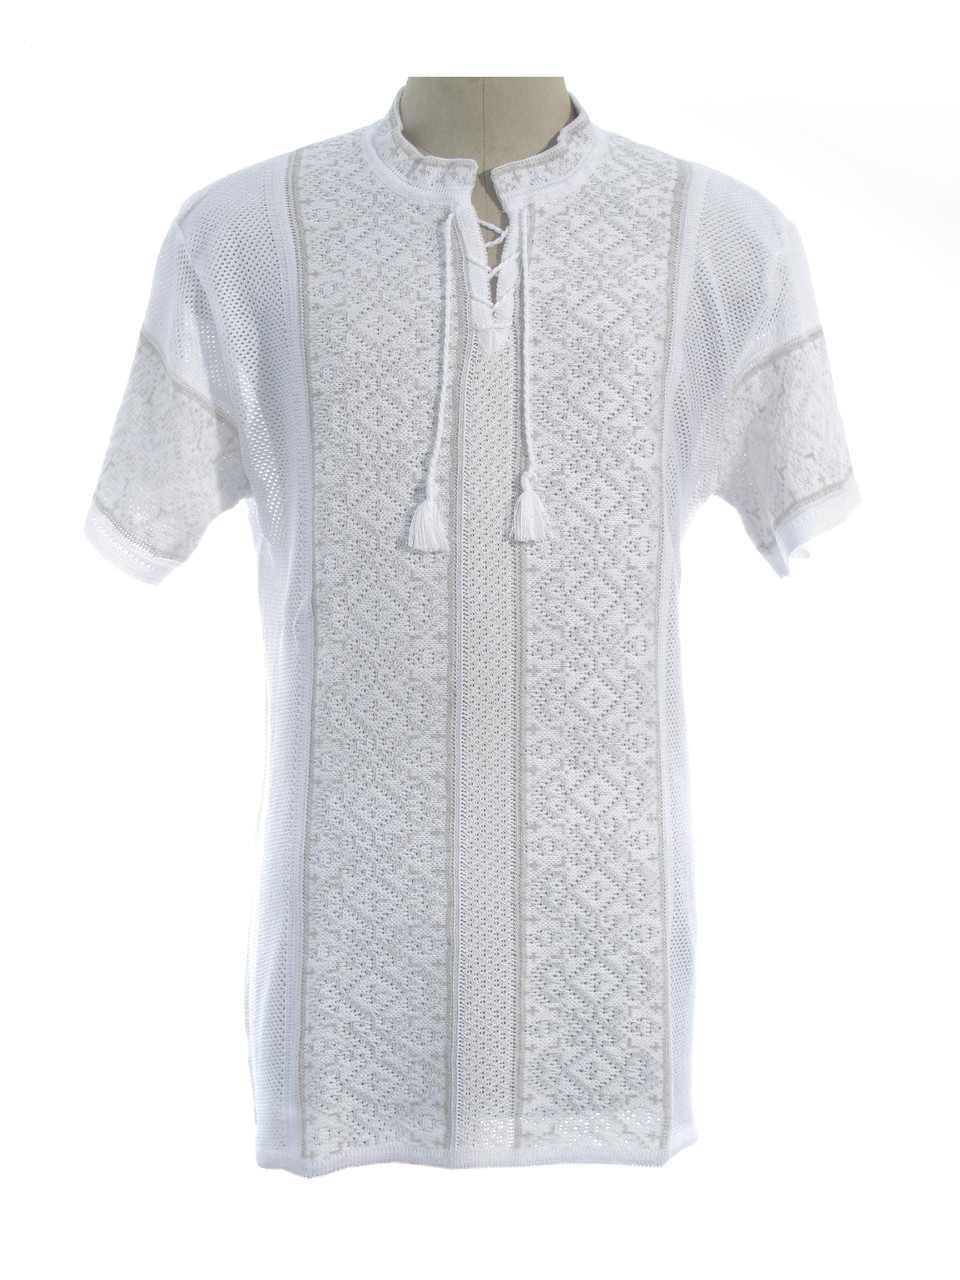 Мужская вязаная рубашка Роман (короткий рукав) (х/б)